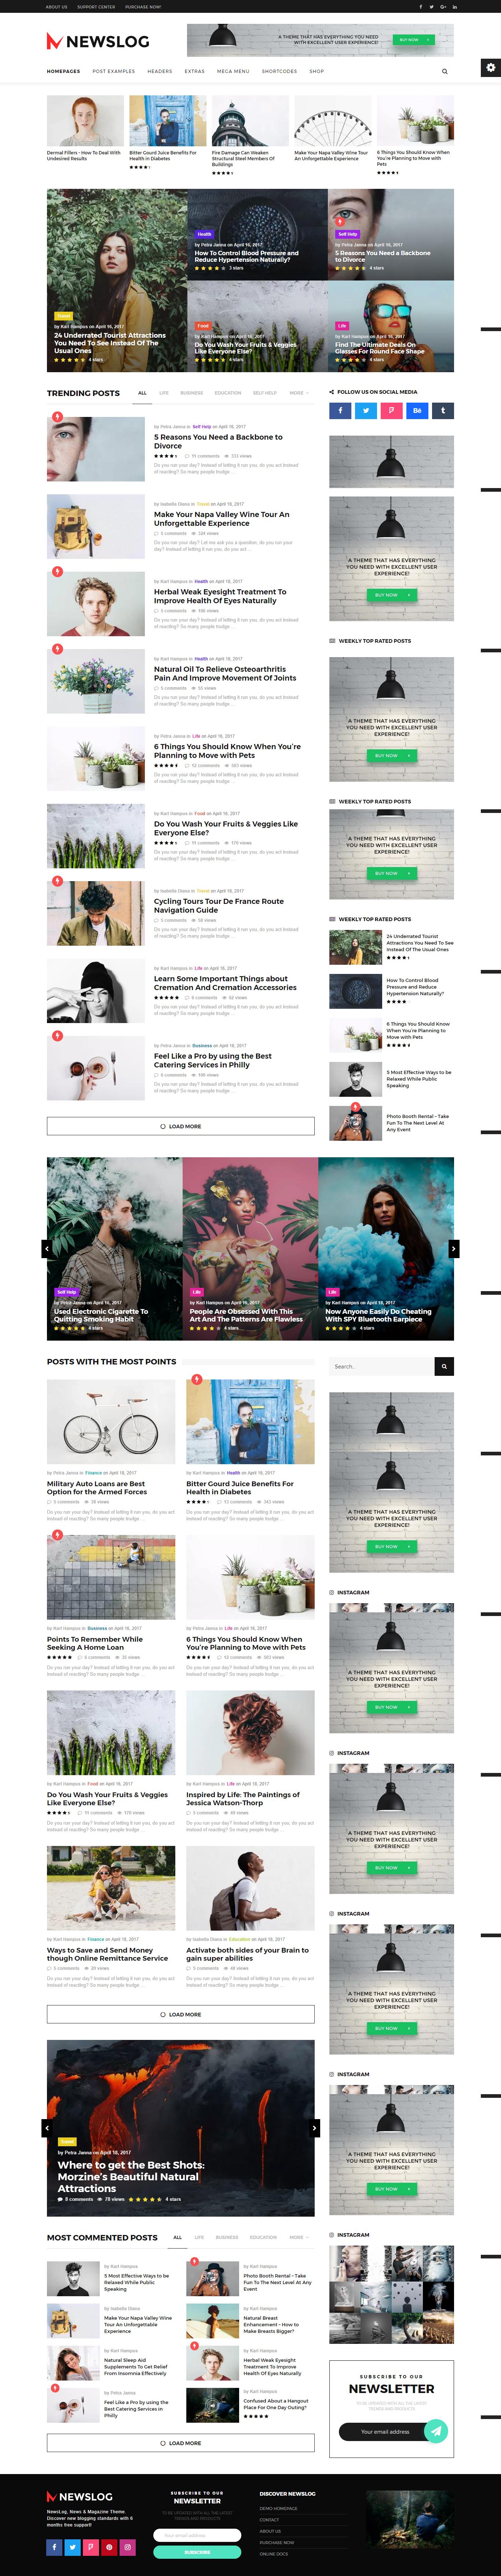 Newslog - Clean News & Magazine WordPress Theme | Blog templates ...